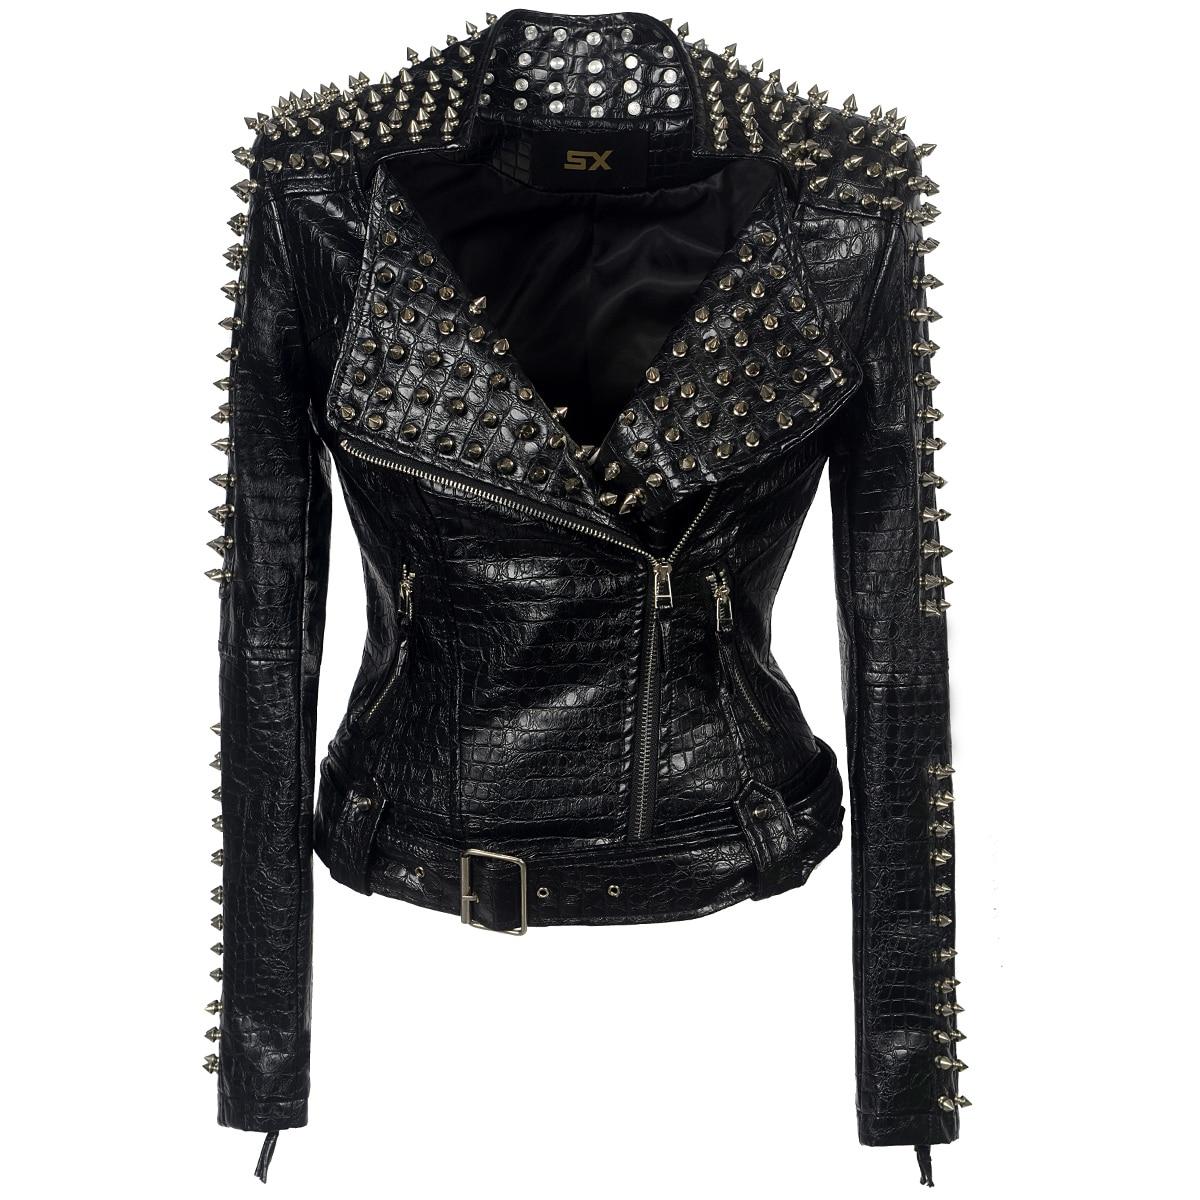 Faux leather PU Jacket Punk Rivet Women  fashion Winter AutumnMotorcycle Jacket Black faux leather  Coat Outerwear Punk